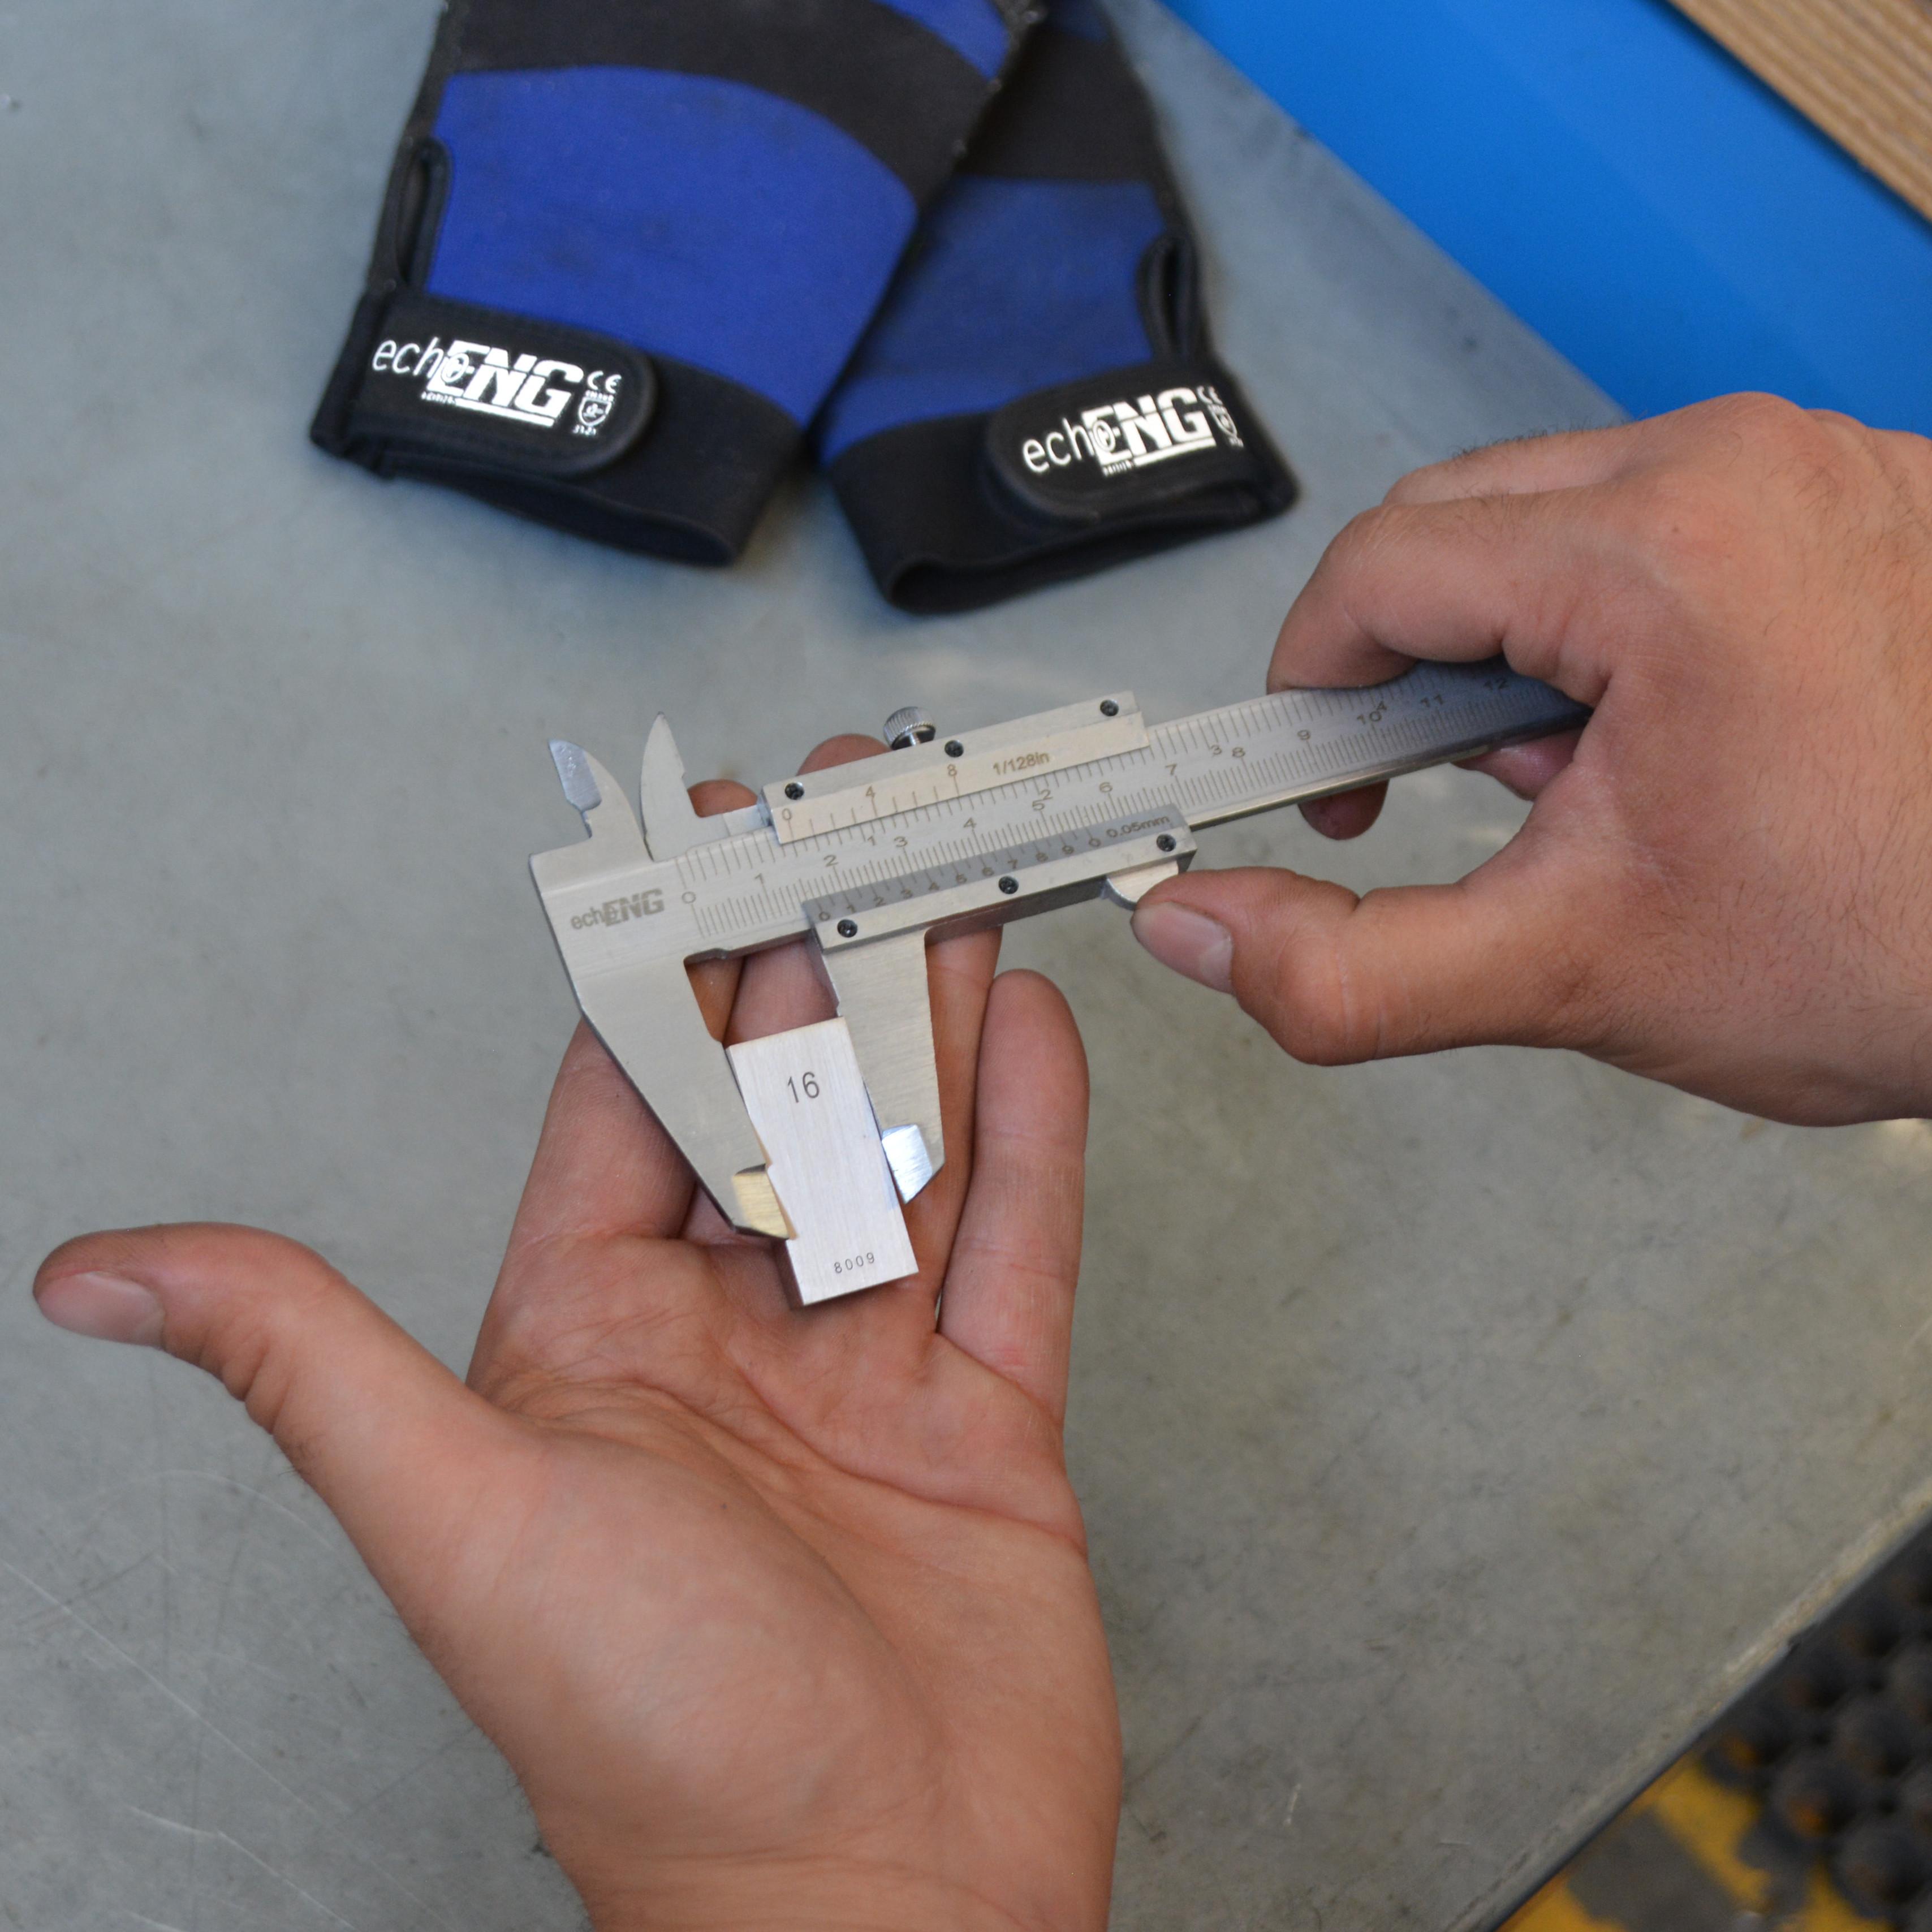 Calibro analogico 150mm - echoENG - SM 10 CCQ0